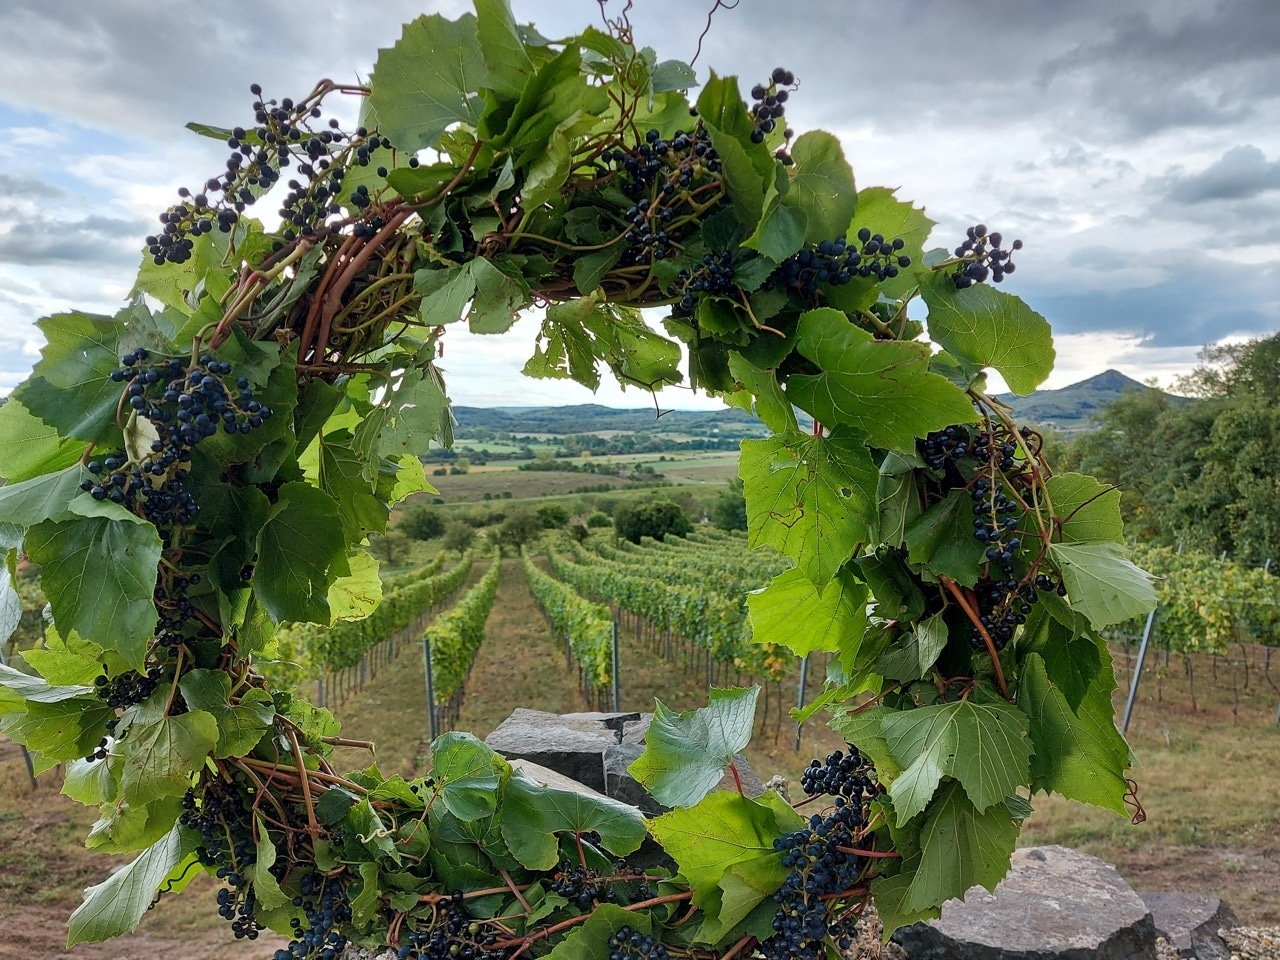 Estate visit Harvest Wreath before Furmint